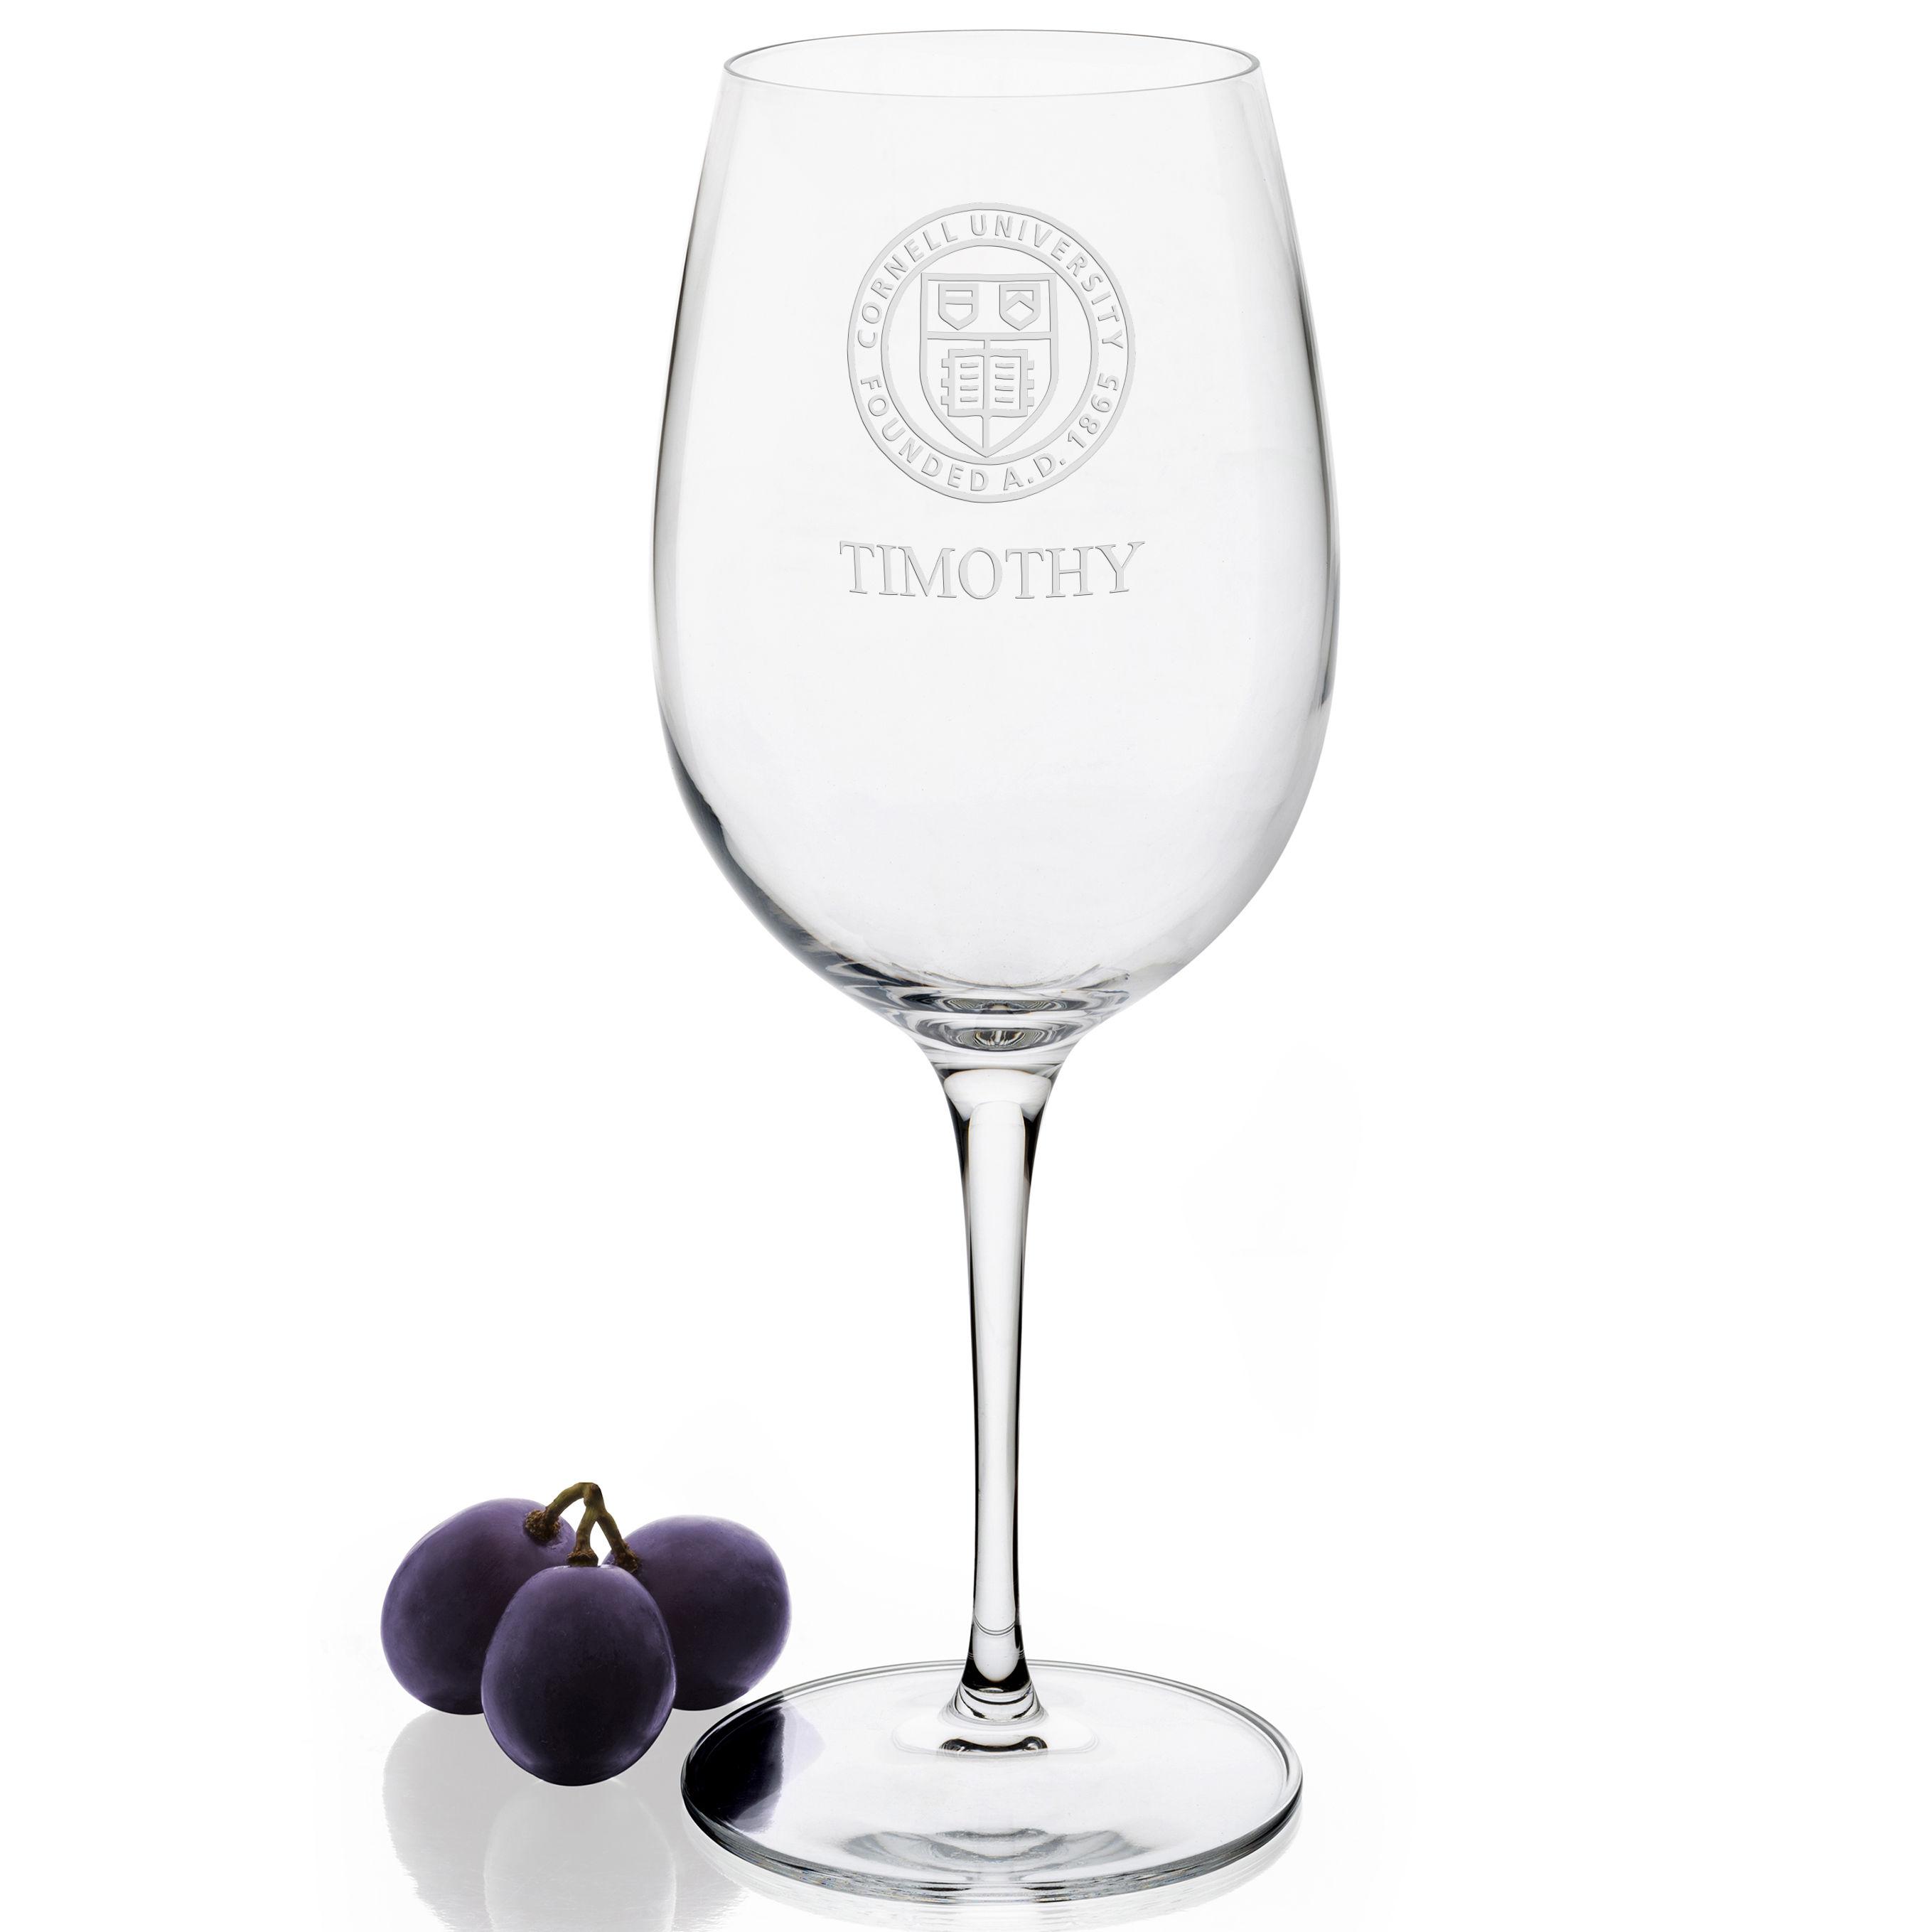 Cornell University Red Wine Glasses - Set of 2 - Image 2